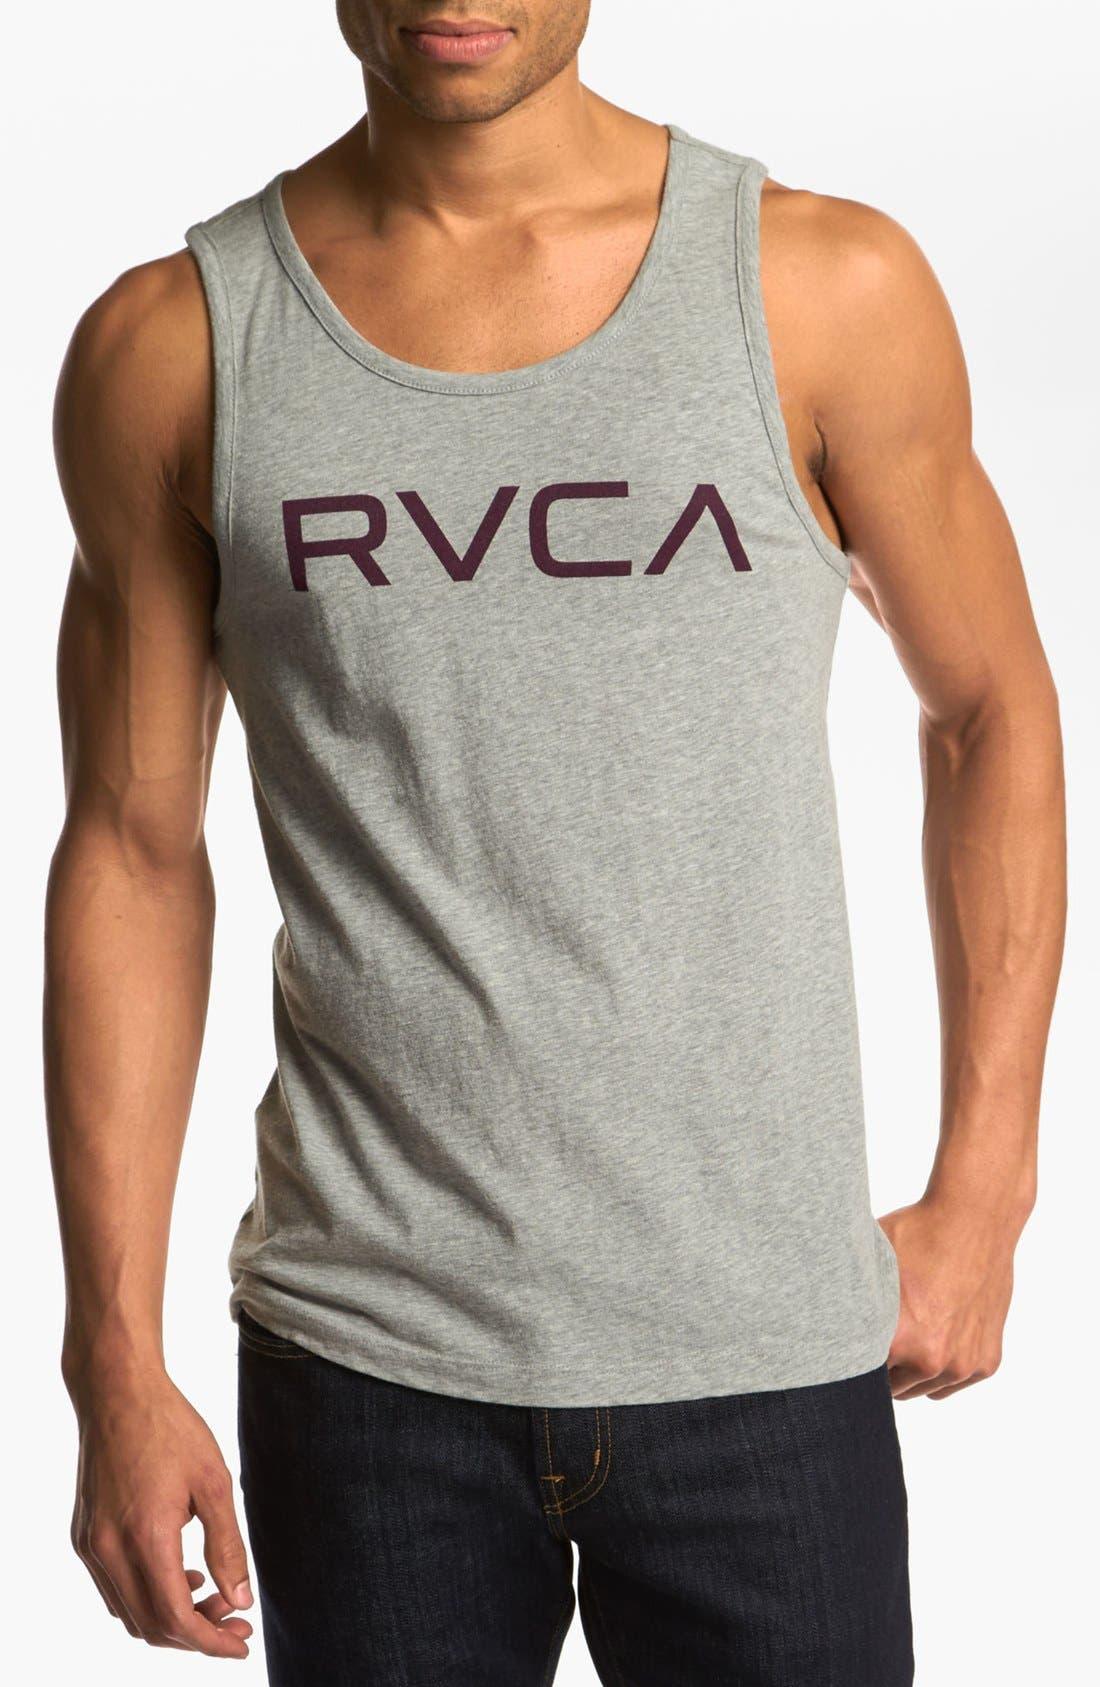 Alternate Image 1 Selected - RVCA 'Big' Tank Top